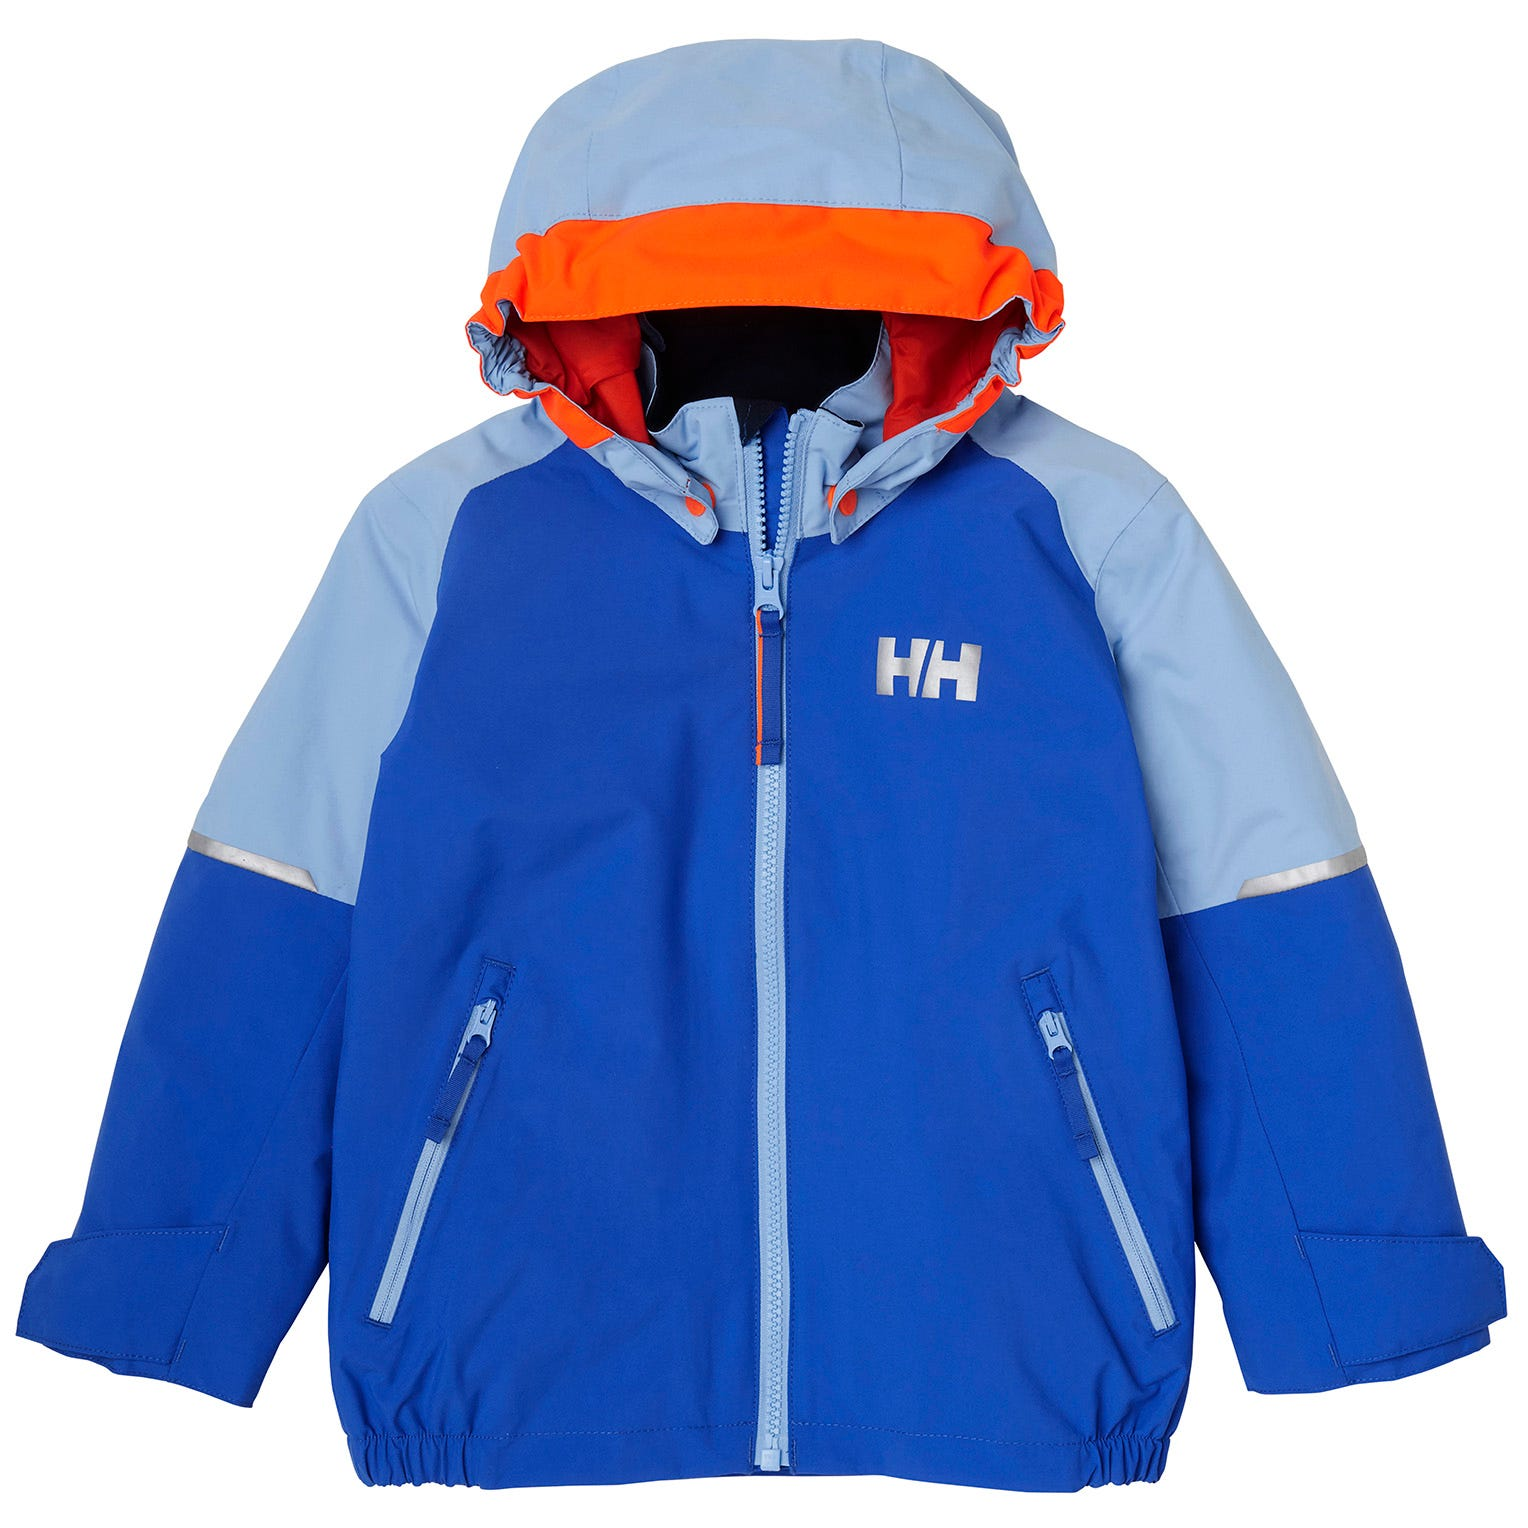 Details about  /Kids Helly Hansen Vilde Parka Waterproof Warm Jacket